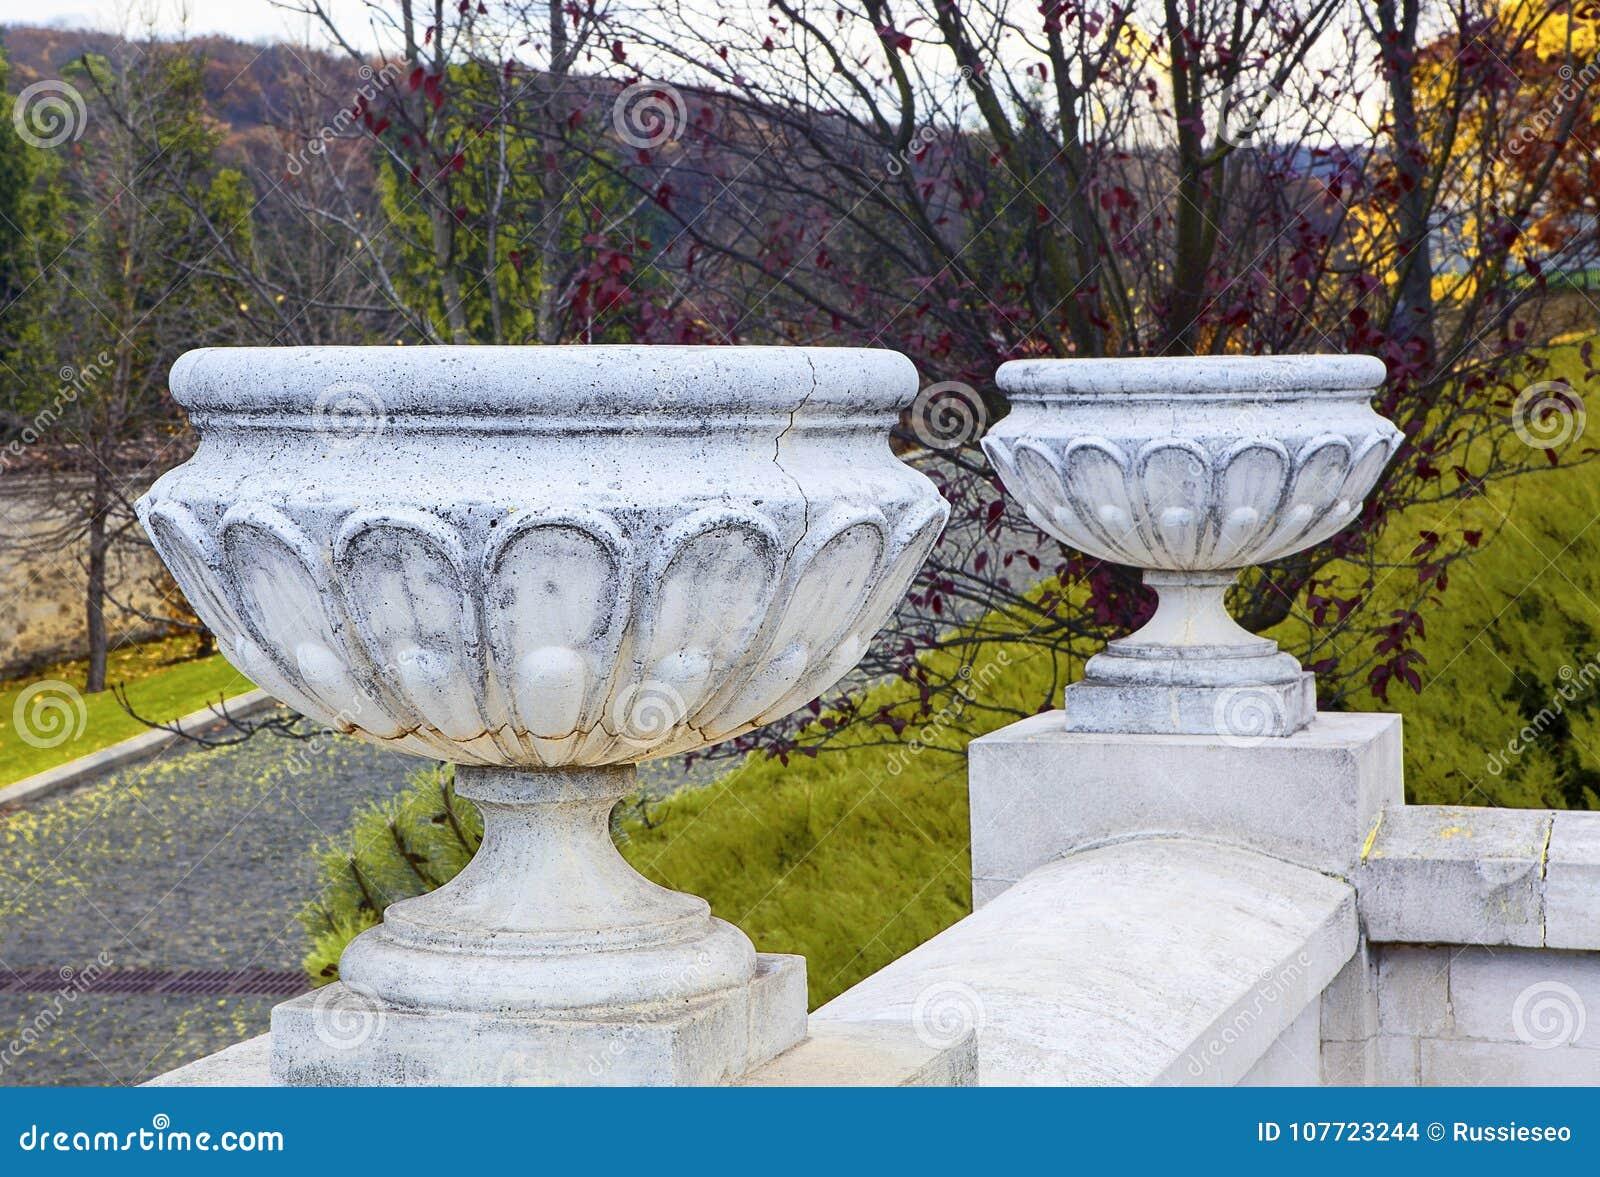 Vasi Bianchi Per Fiori Da Esterno.Grandi Vasi Da Fiori Bianchi Fotografia Stock Immagine Di